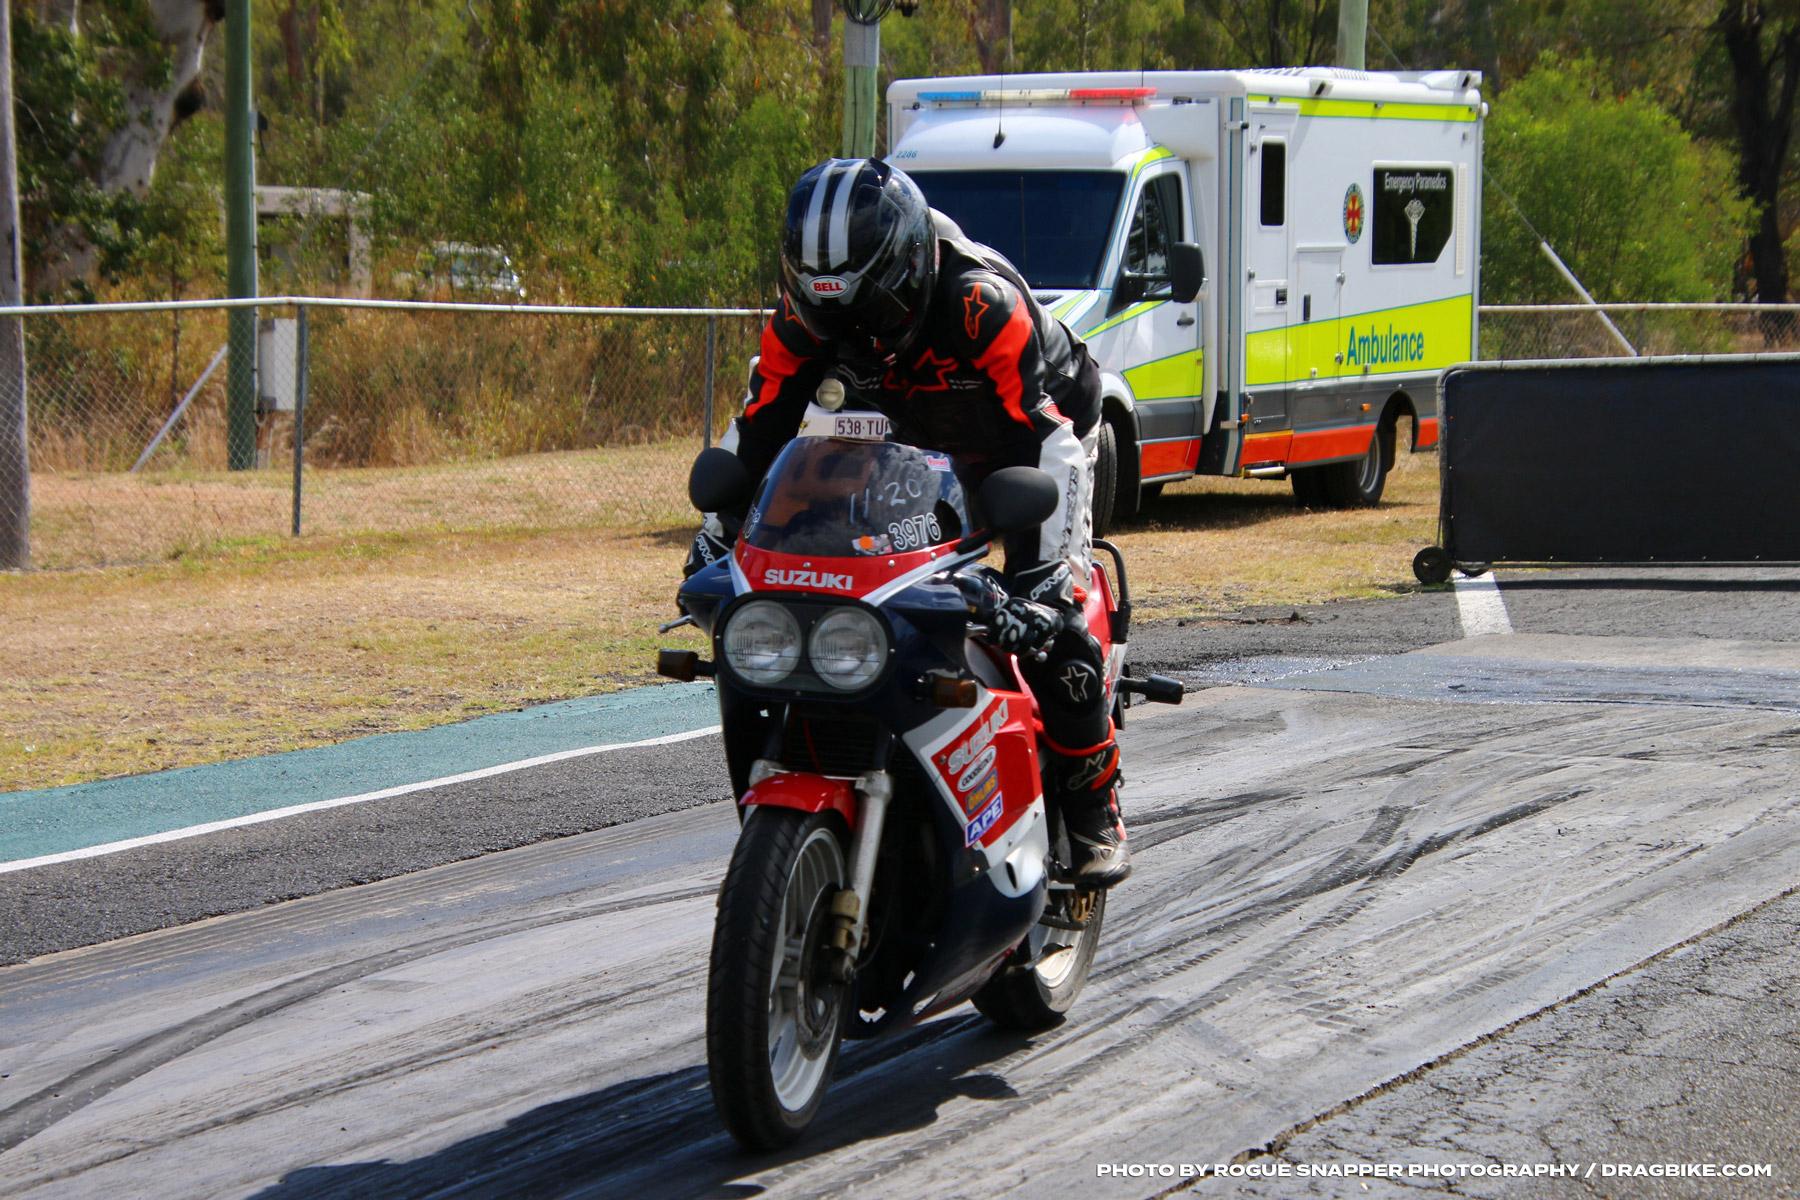 Andra: Queensland Championship Heats Up At Benaraby Raceway with Benaraby Raceway Calendar